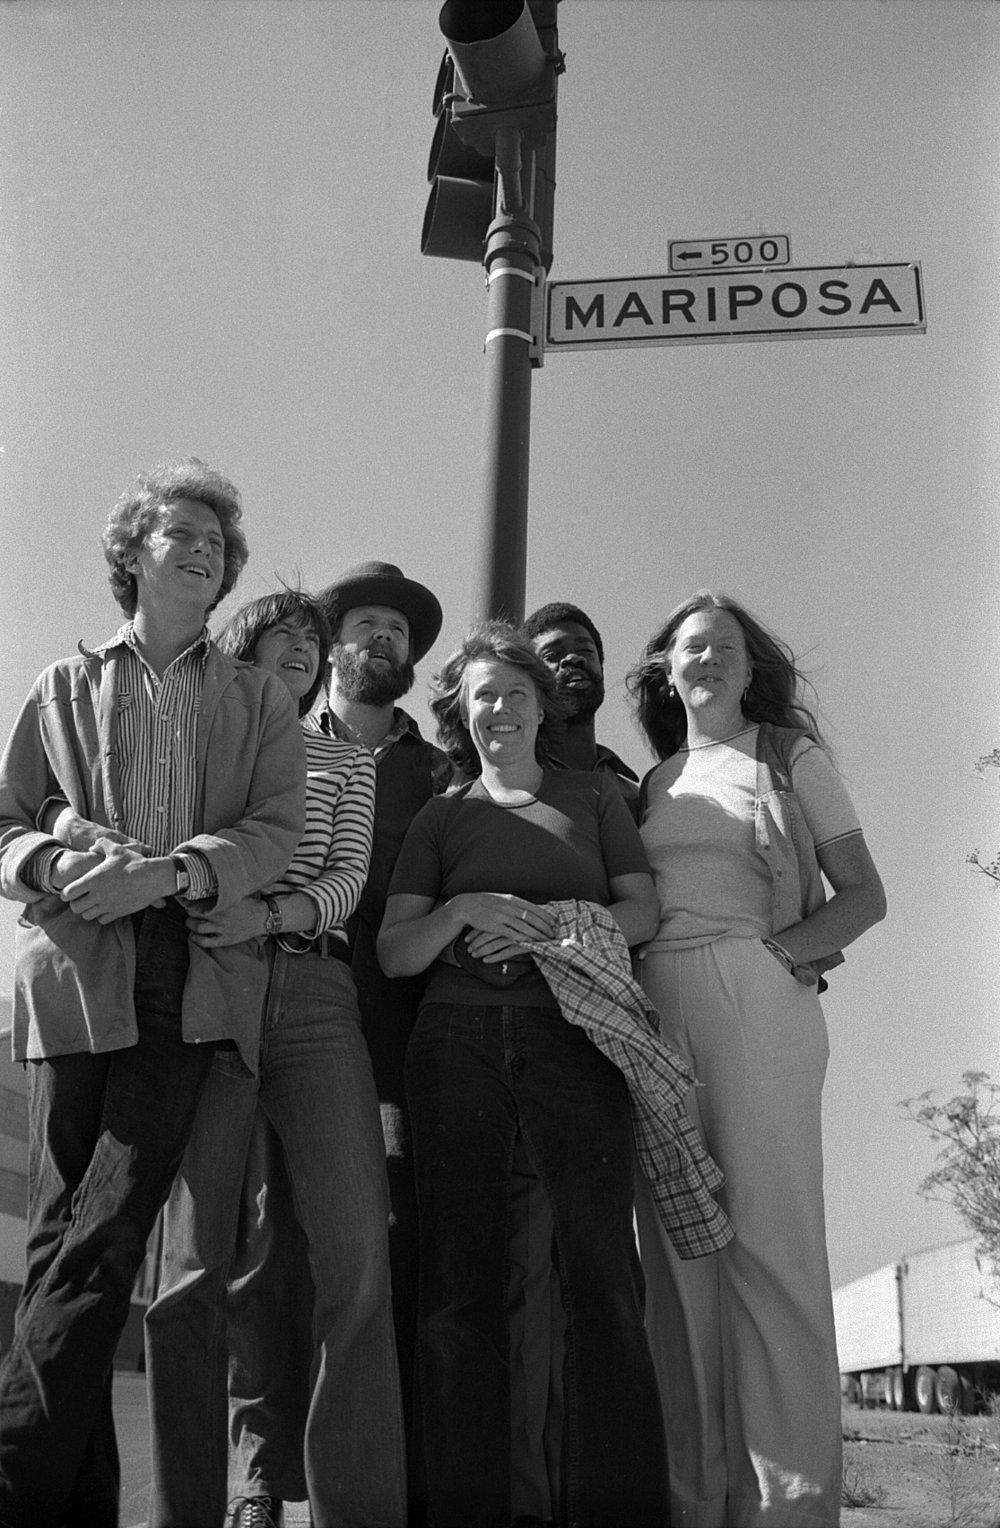 027 Mariposa sign.jpg